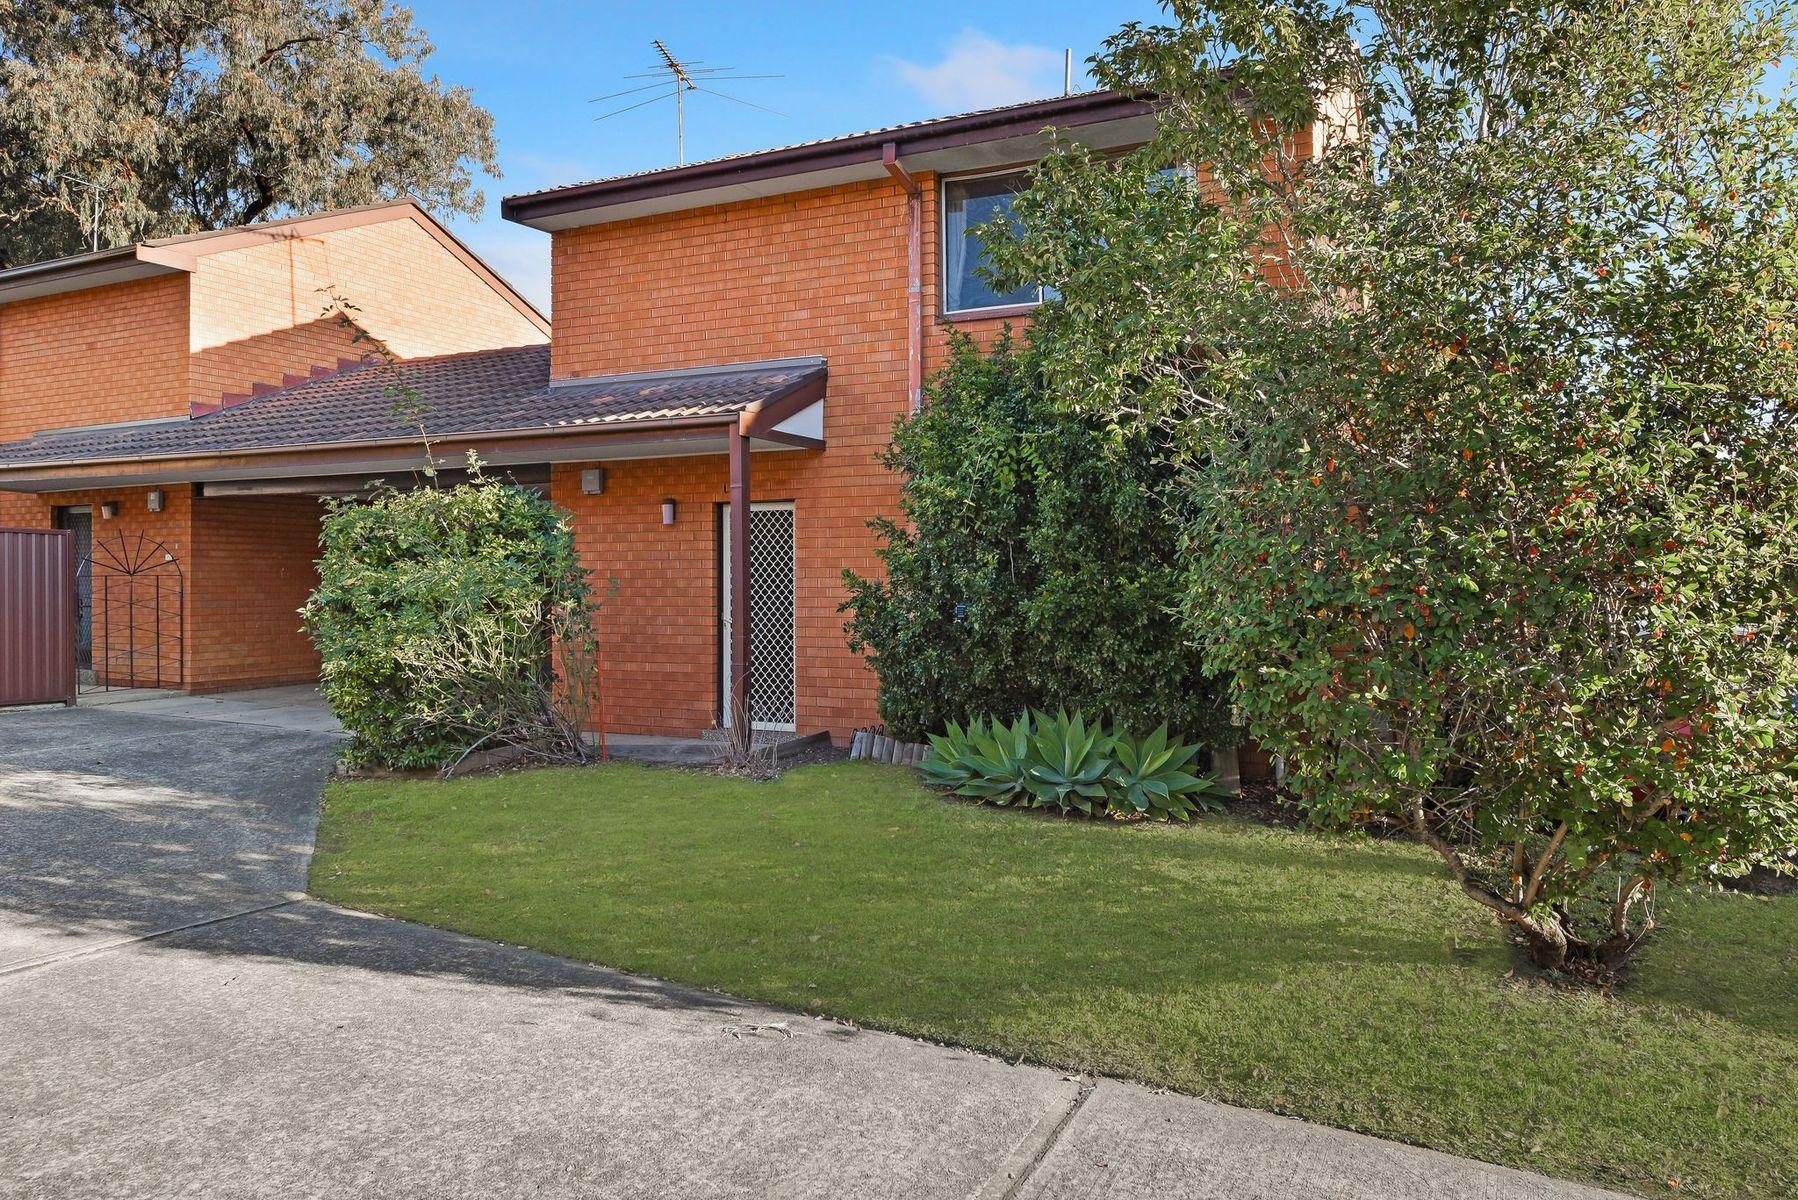 12/26 Kingsclare Street, Leumeah, NSW 2560